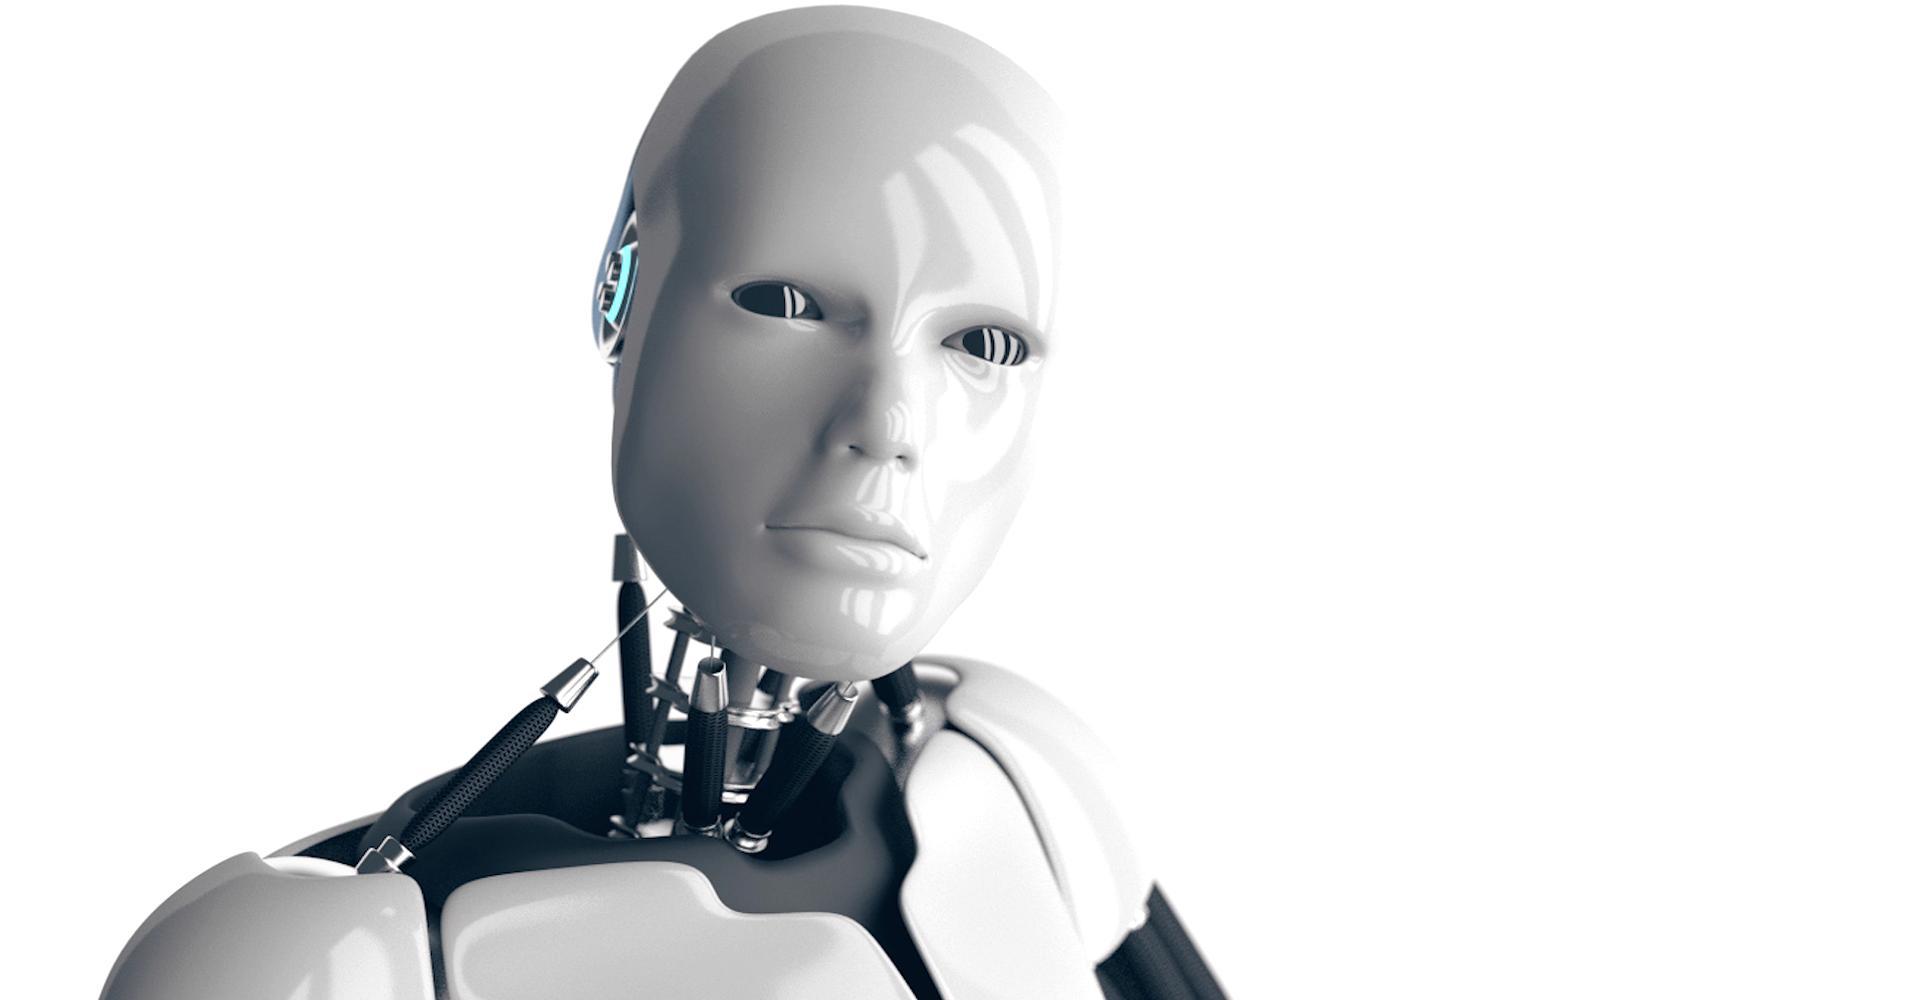 104117471-makeit_robots_take_jobs_clifford_mezz_1910x1000.jpg